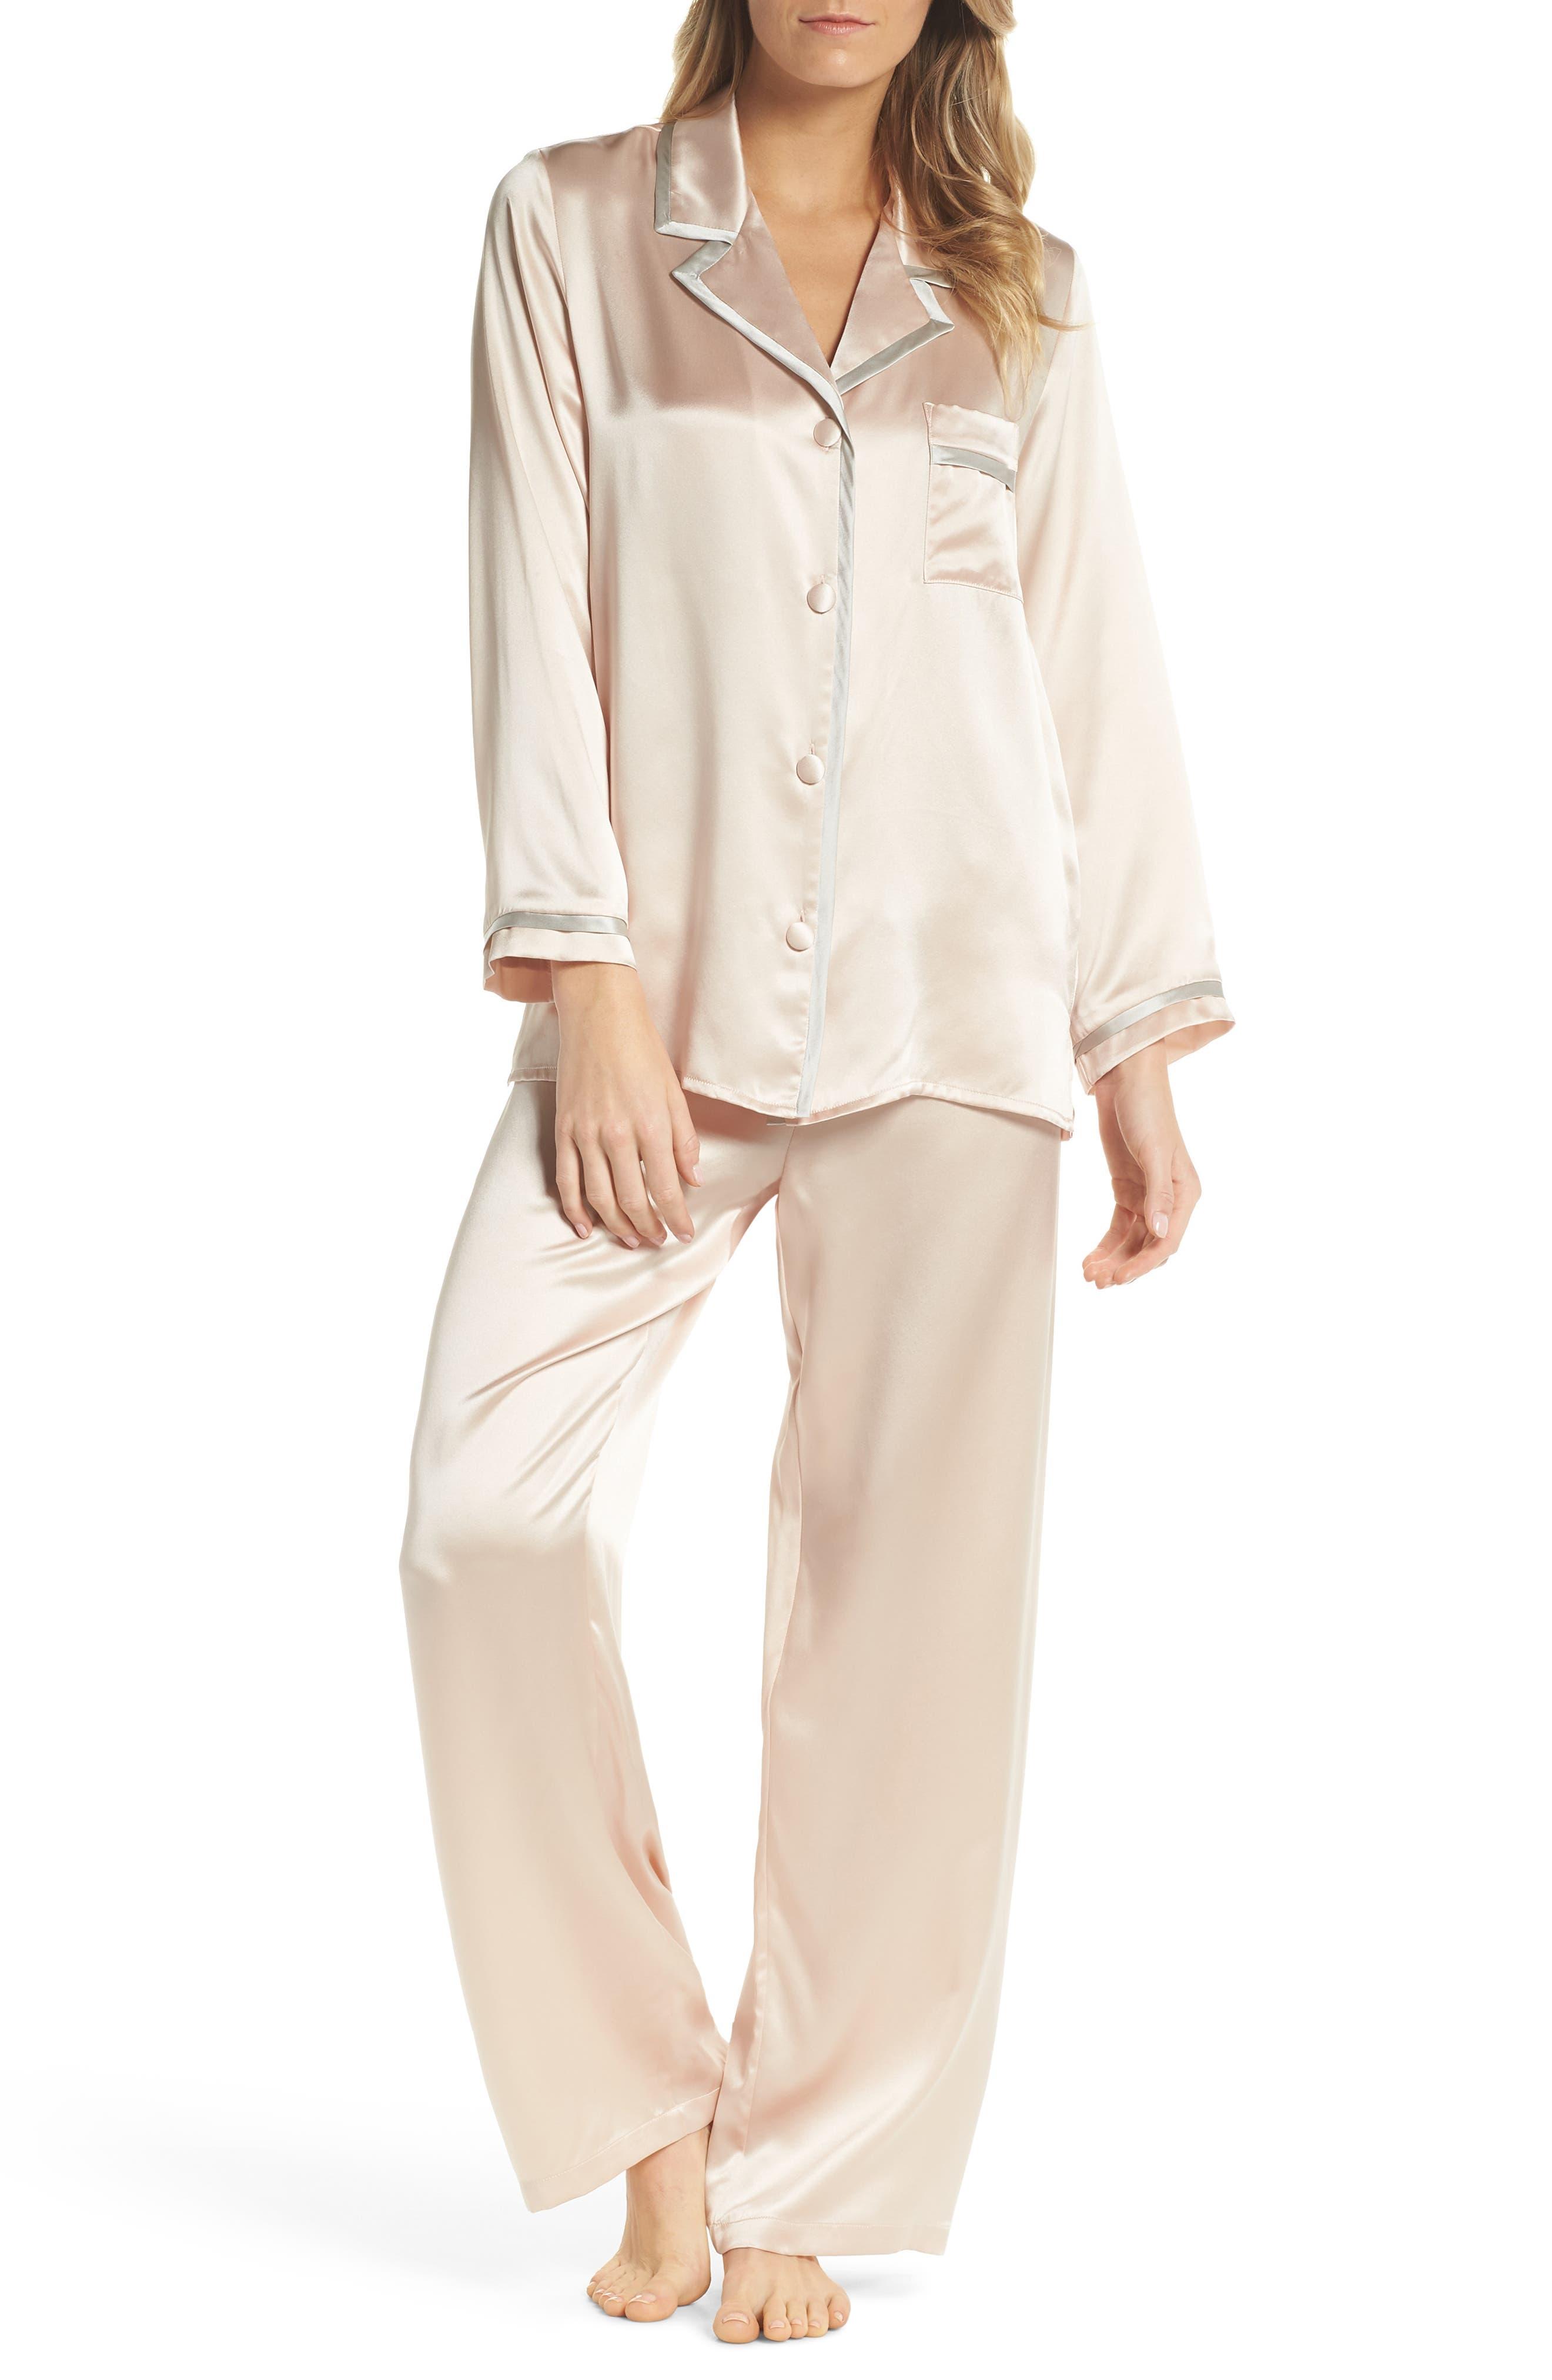 Coco Silk Pajamas,                             Main thumbnail 1, color,                             Rose Quartz / Antique Silver